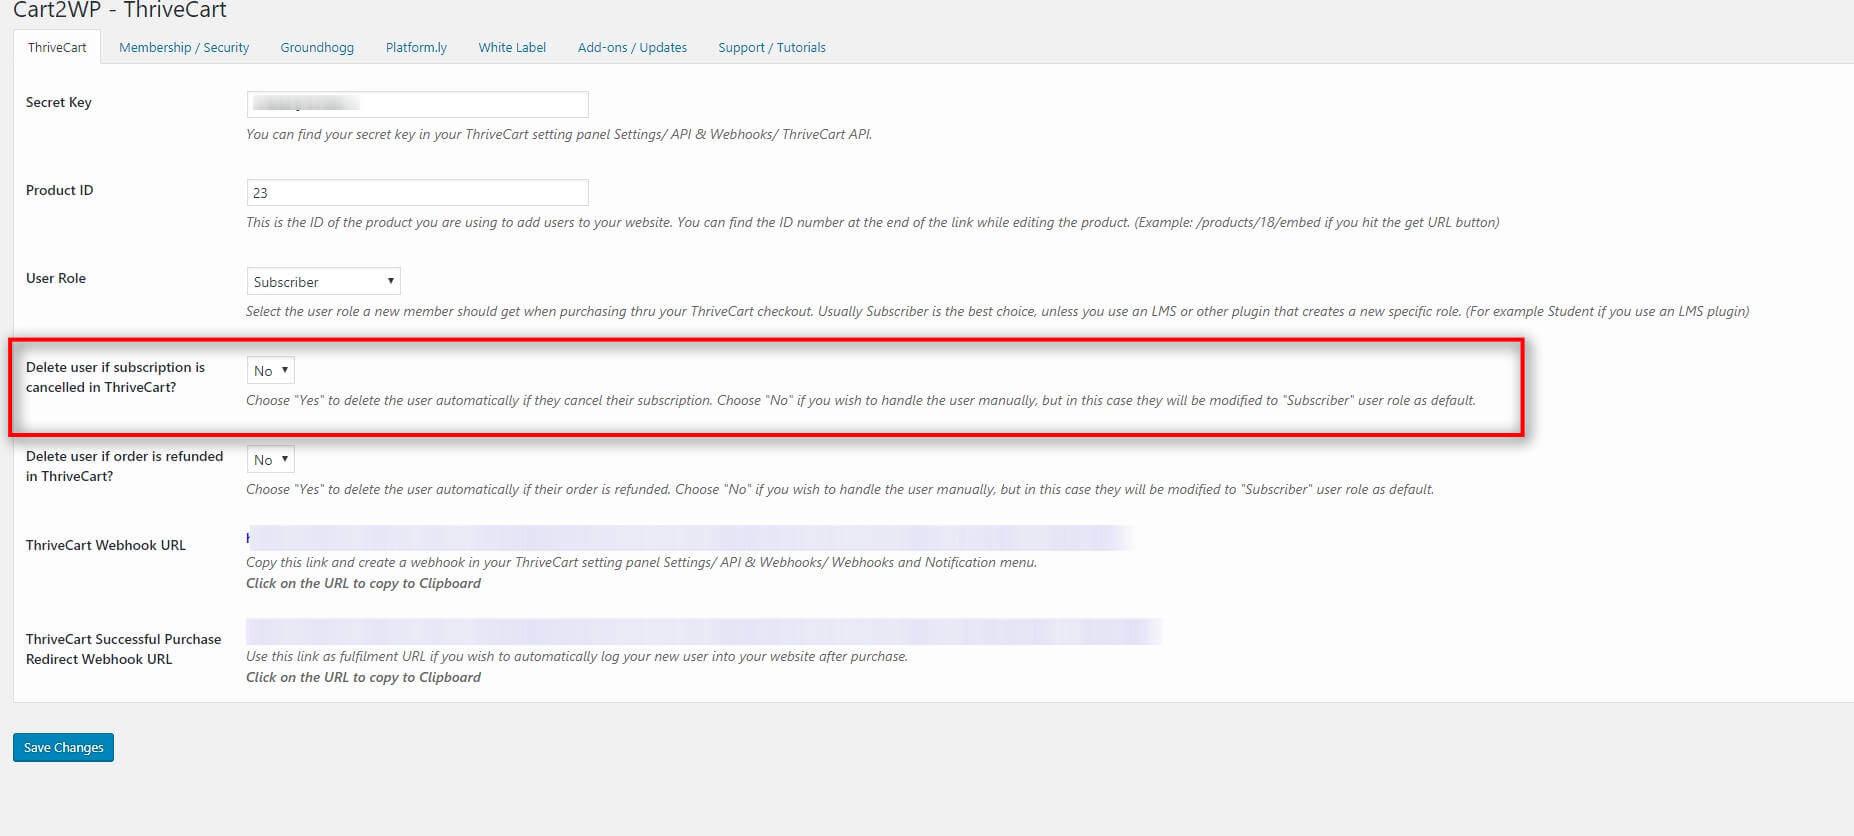 Cart2wp Thrivecart To WordPress Integration V034 Tc Settings 1 (5)